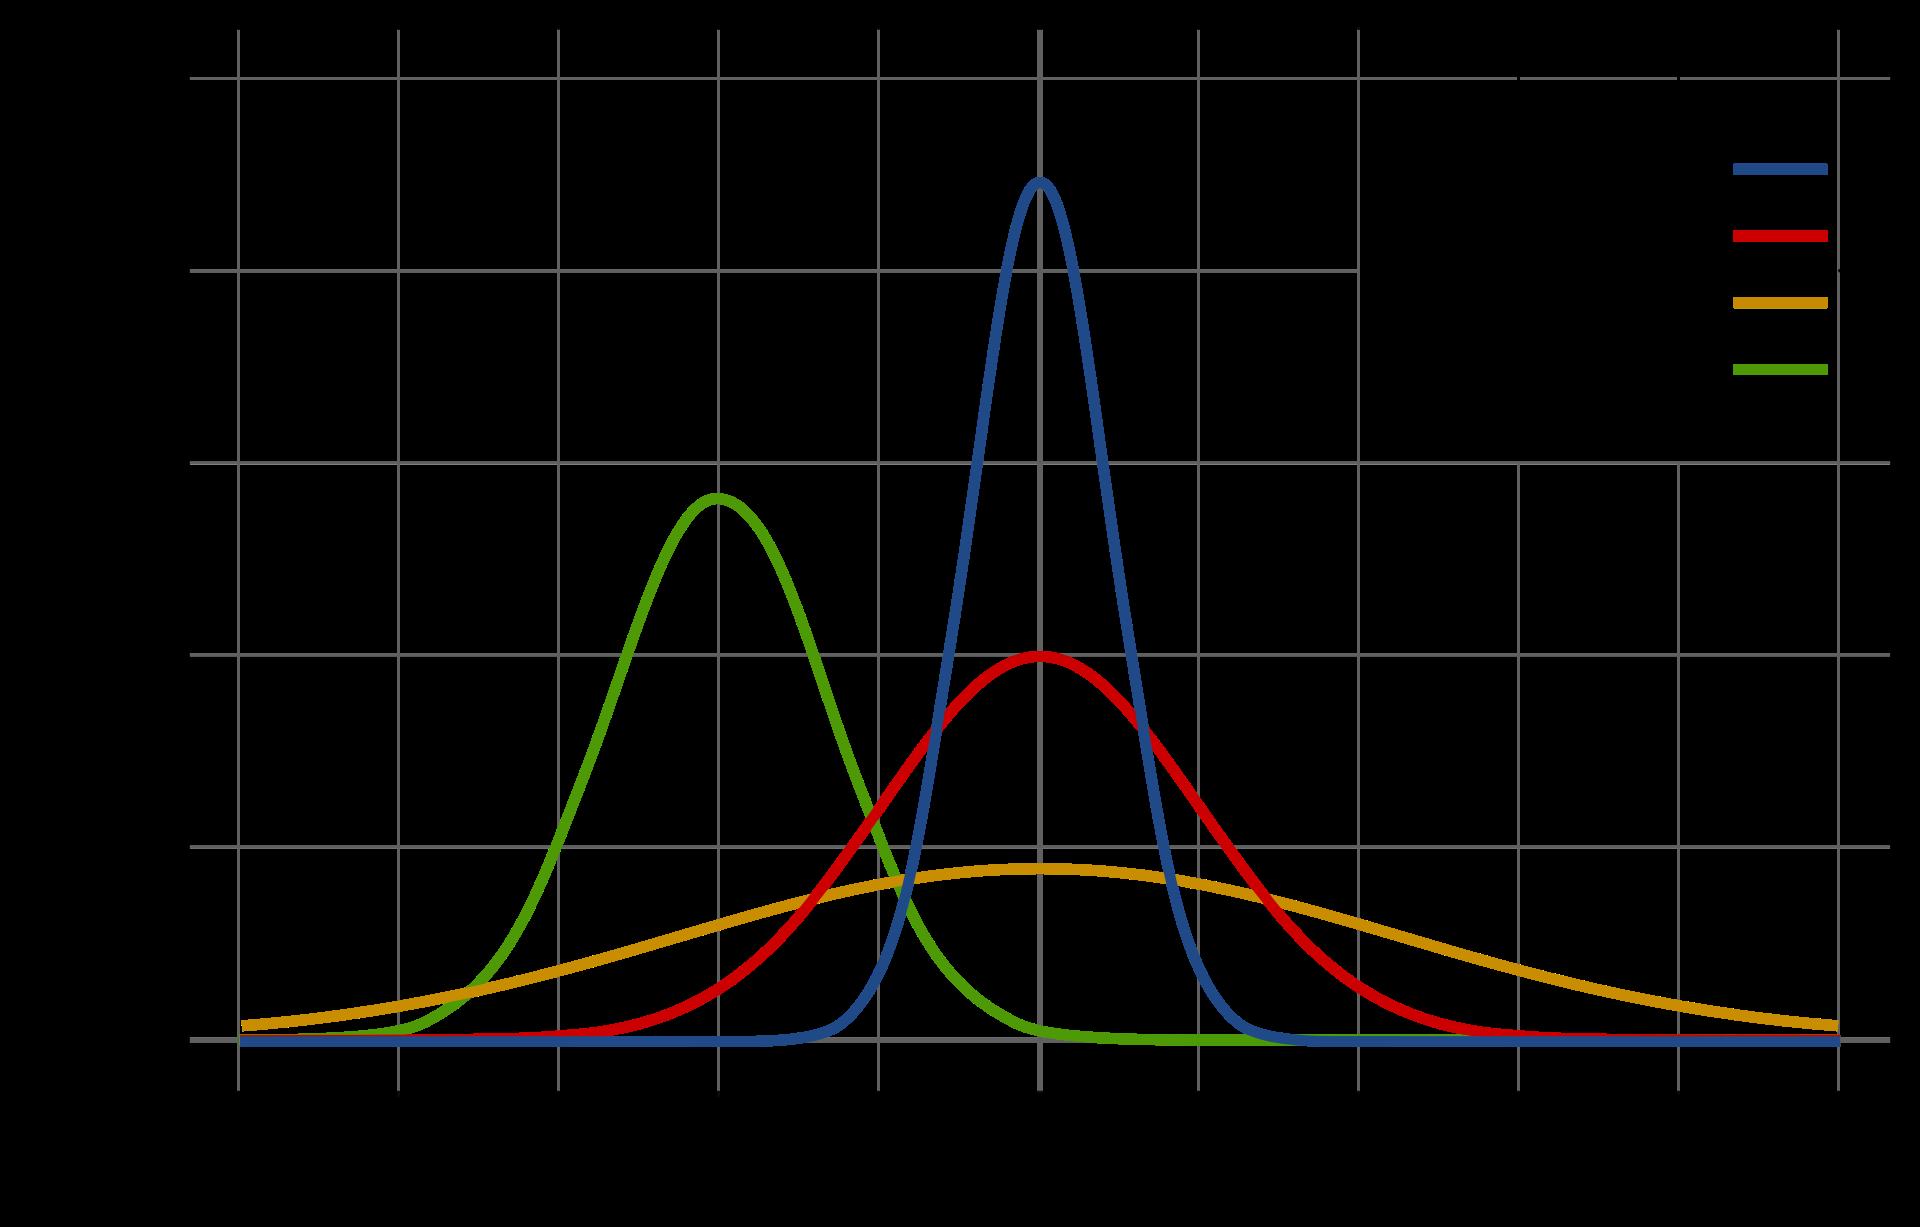 Probability density function of the Gaussian distribution. Source: Wikipedia (https://en.wikipedia.org/wiki/Normal_distribution#/media/File:Normal_Distribution_PDF.svg)